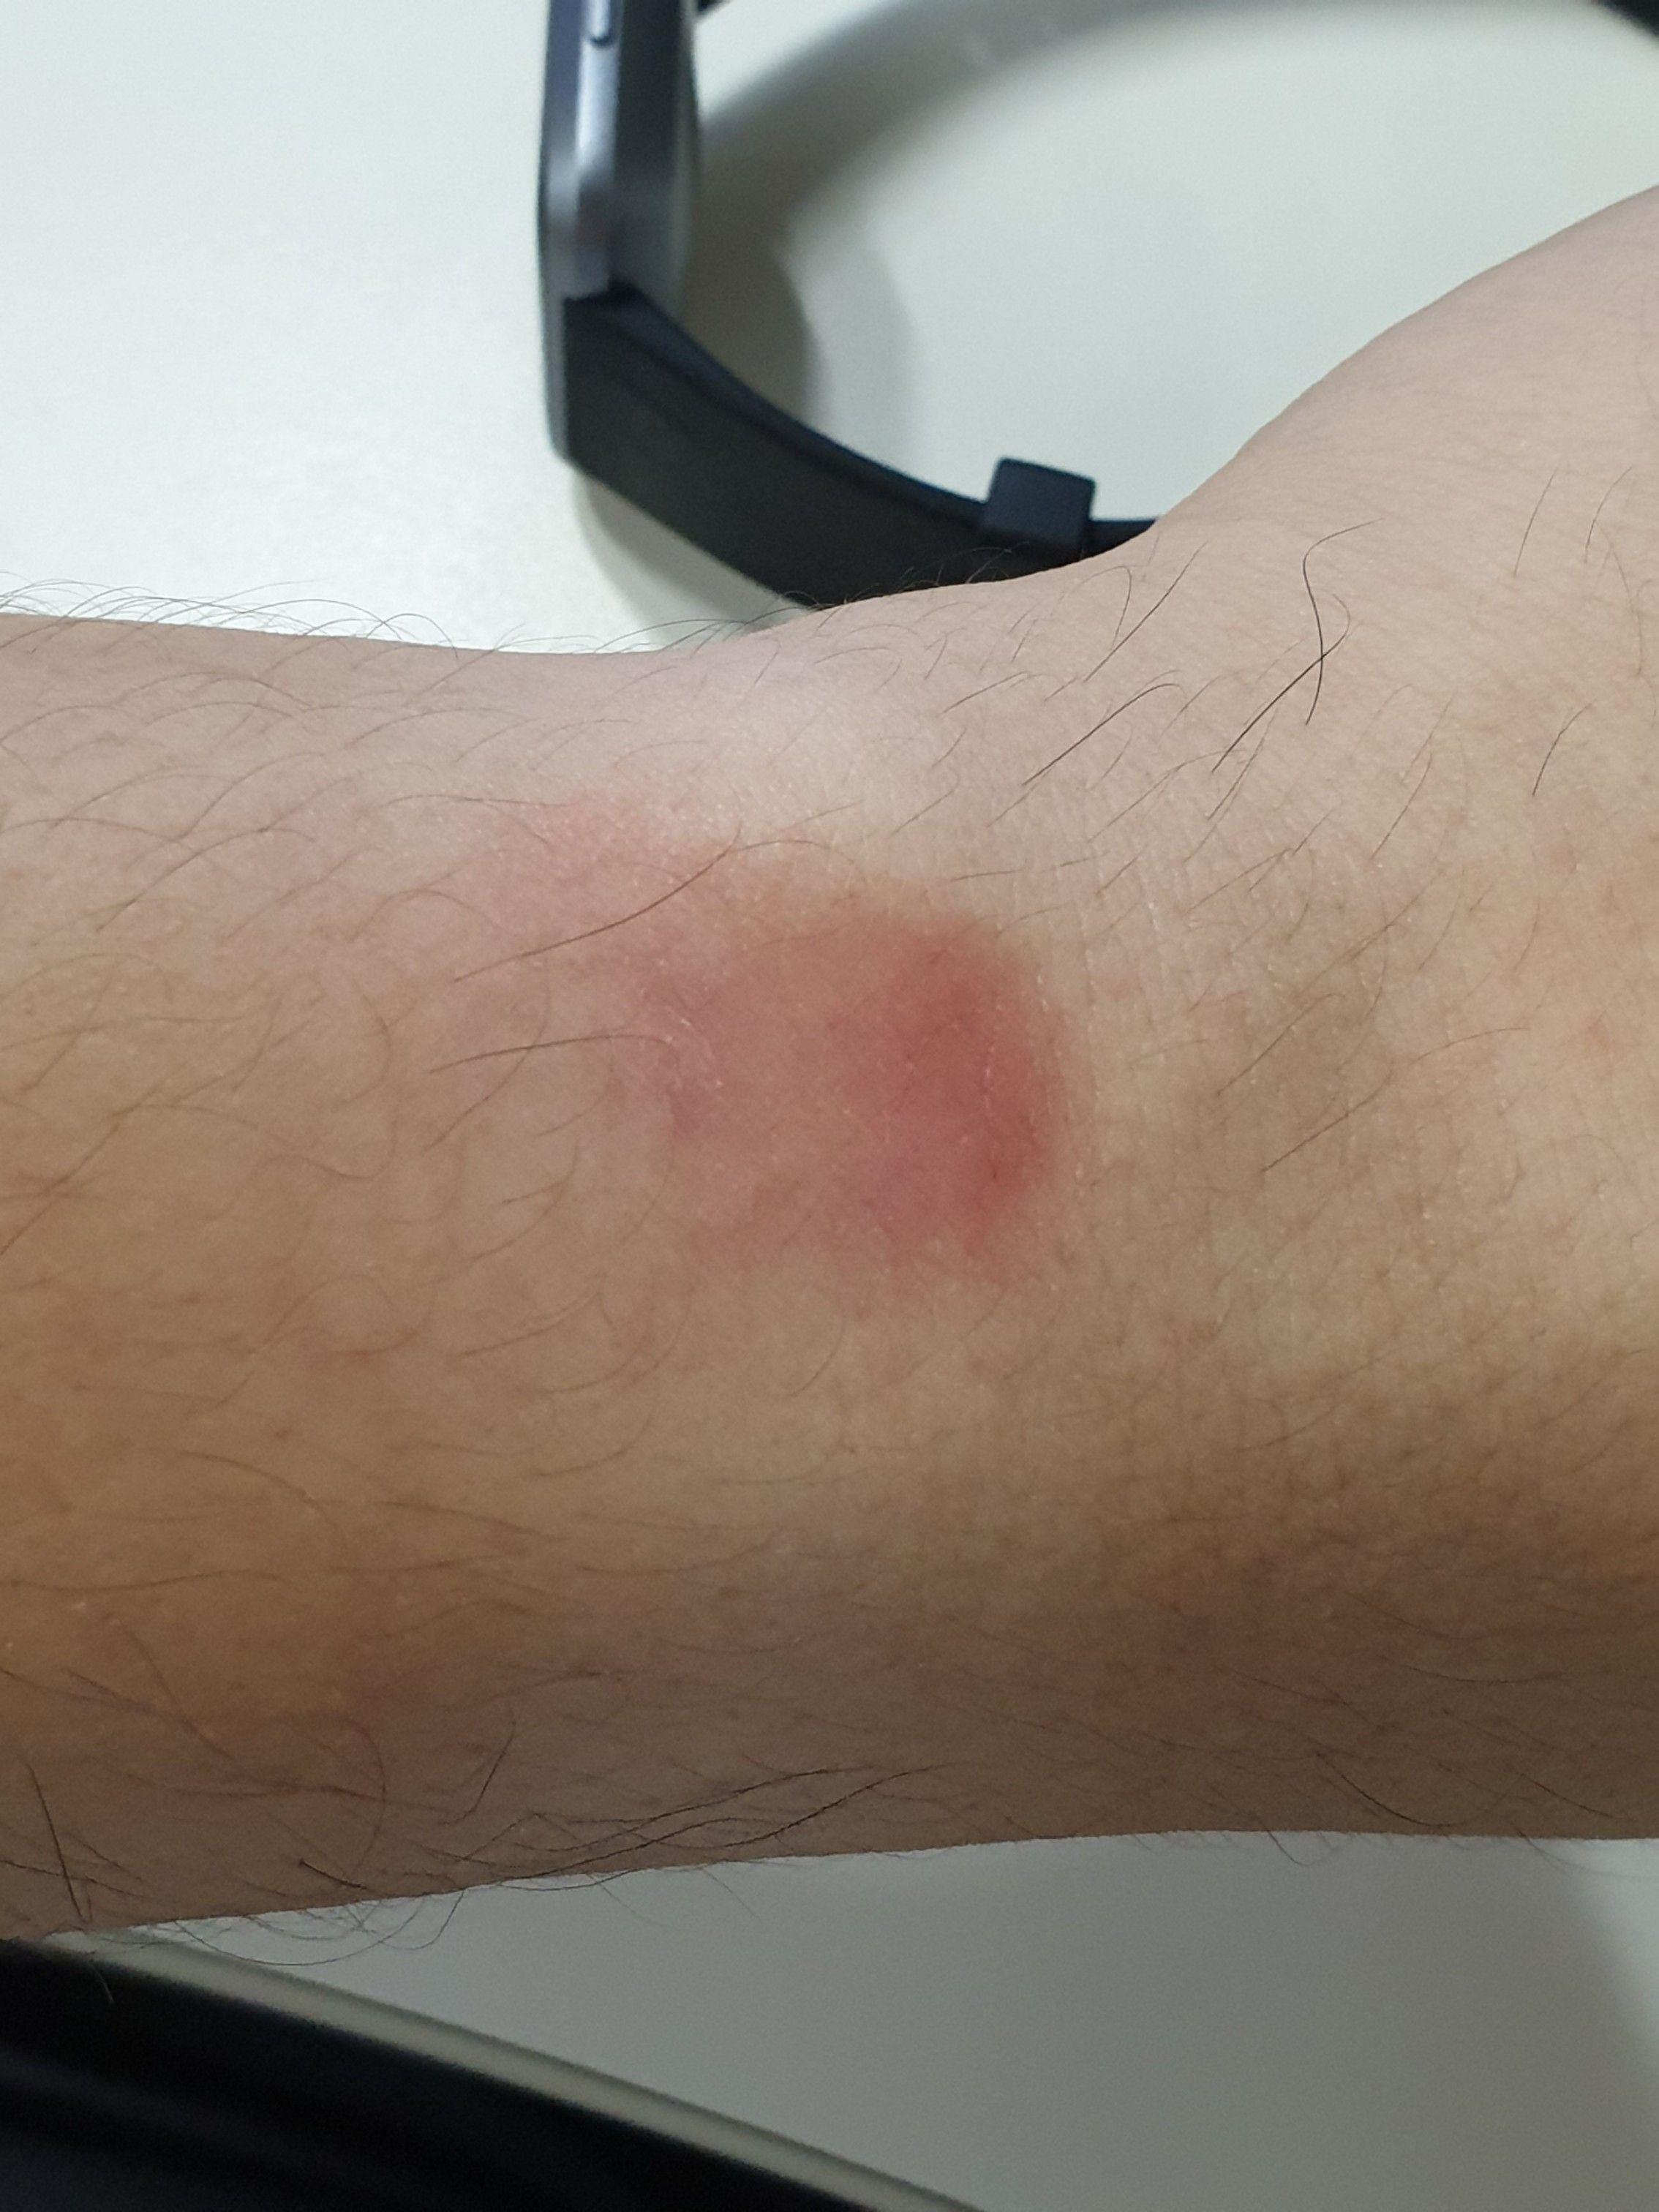 Experiencing skin discomfort, irritation or wrist